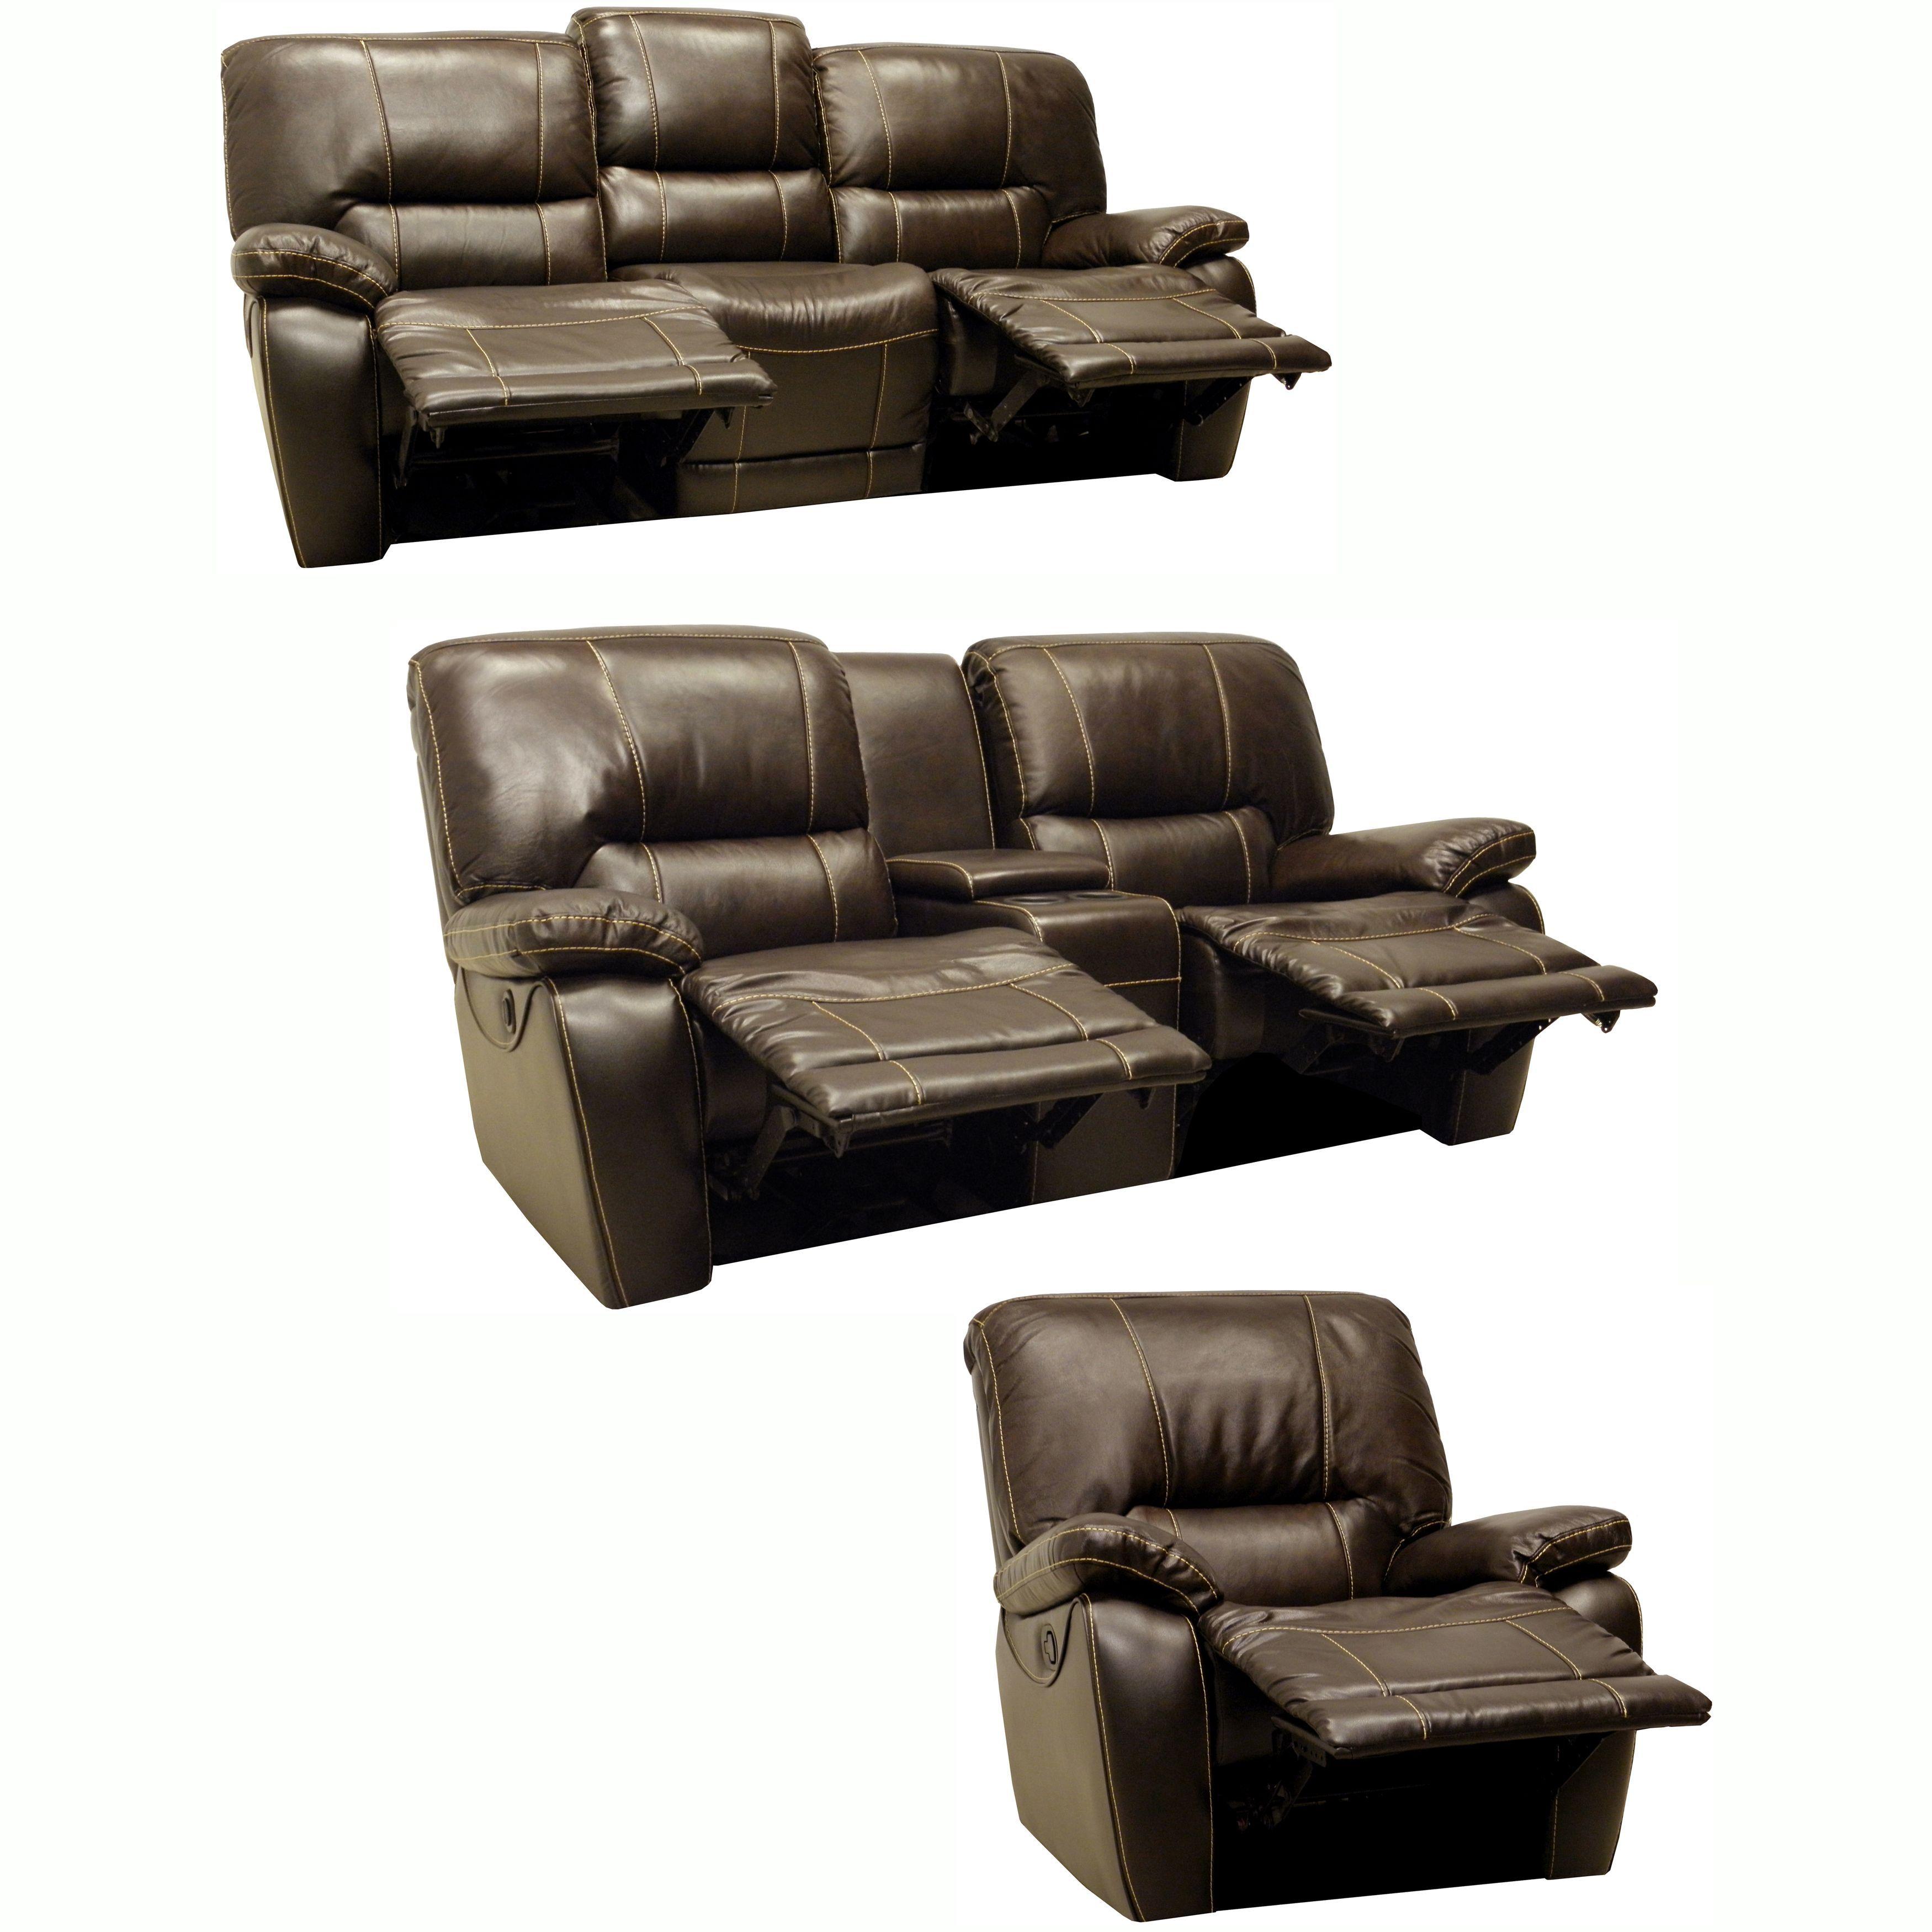 The Walton dark brown Italian leather motorized reclining sofa